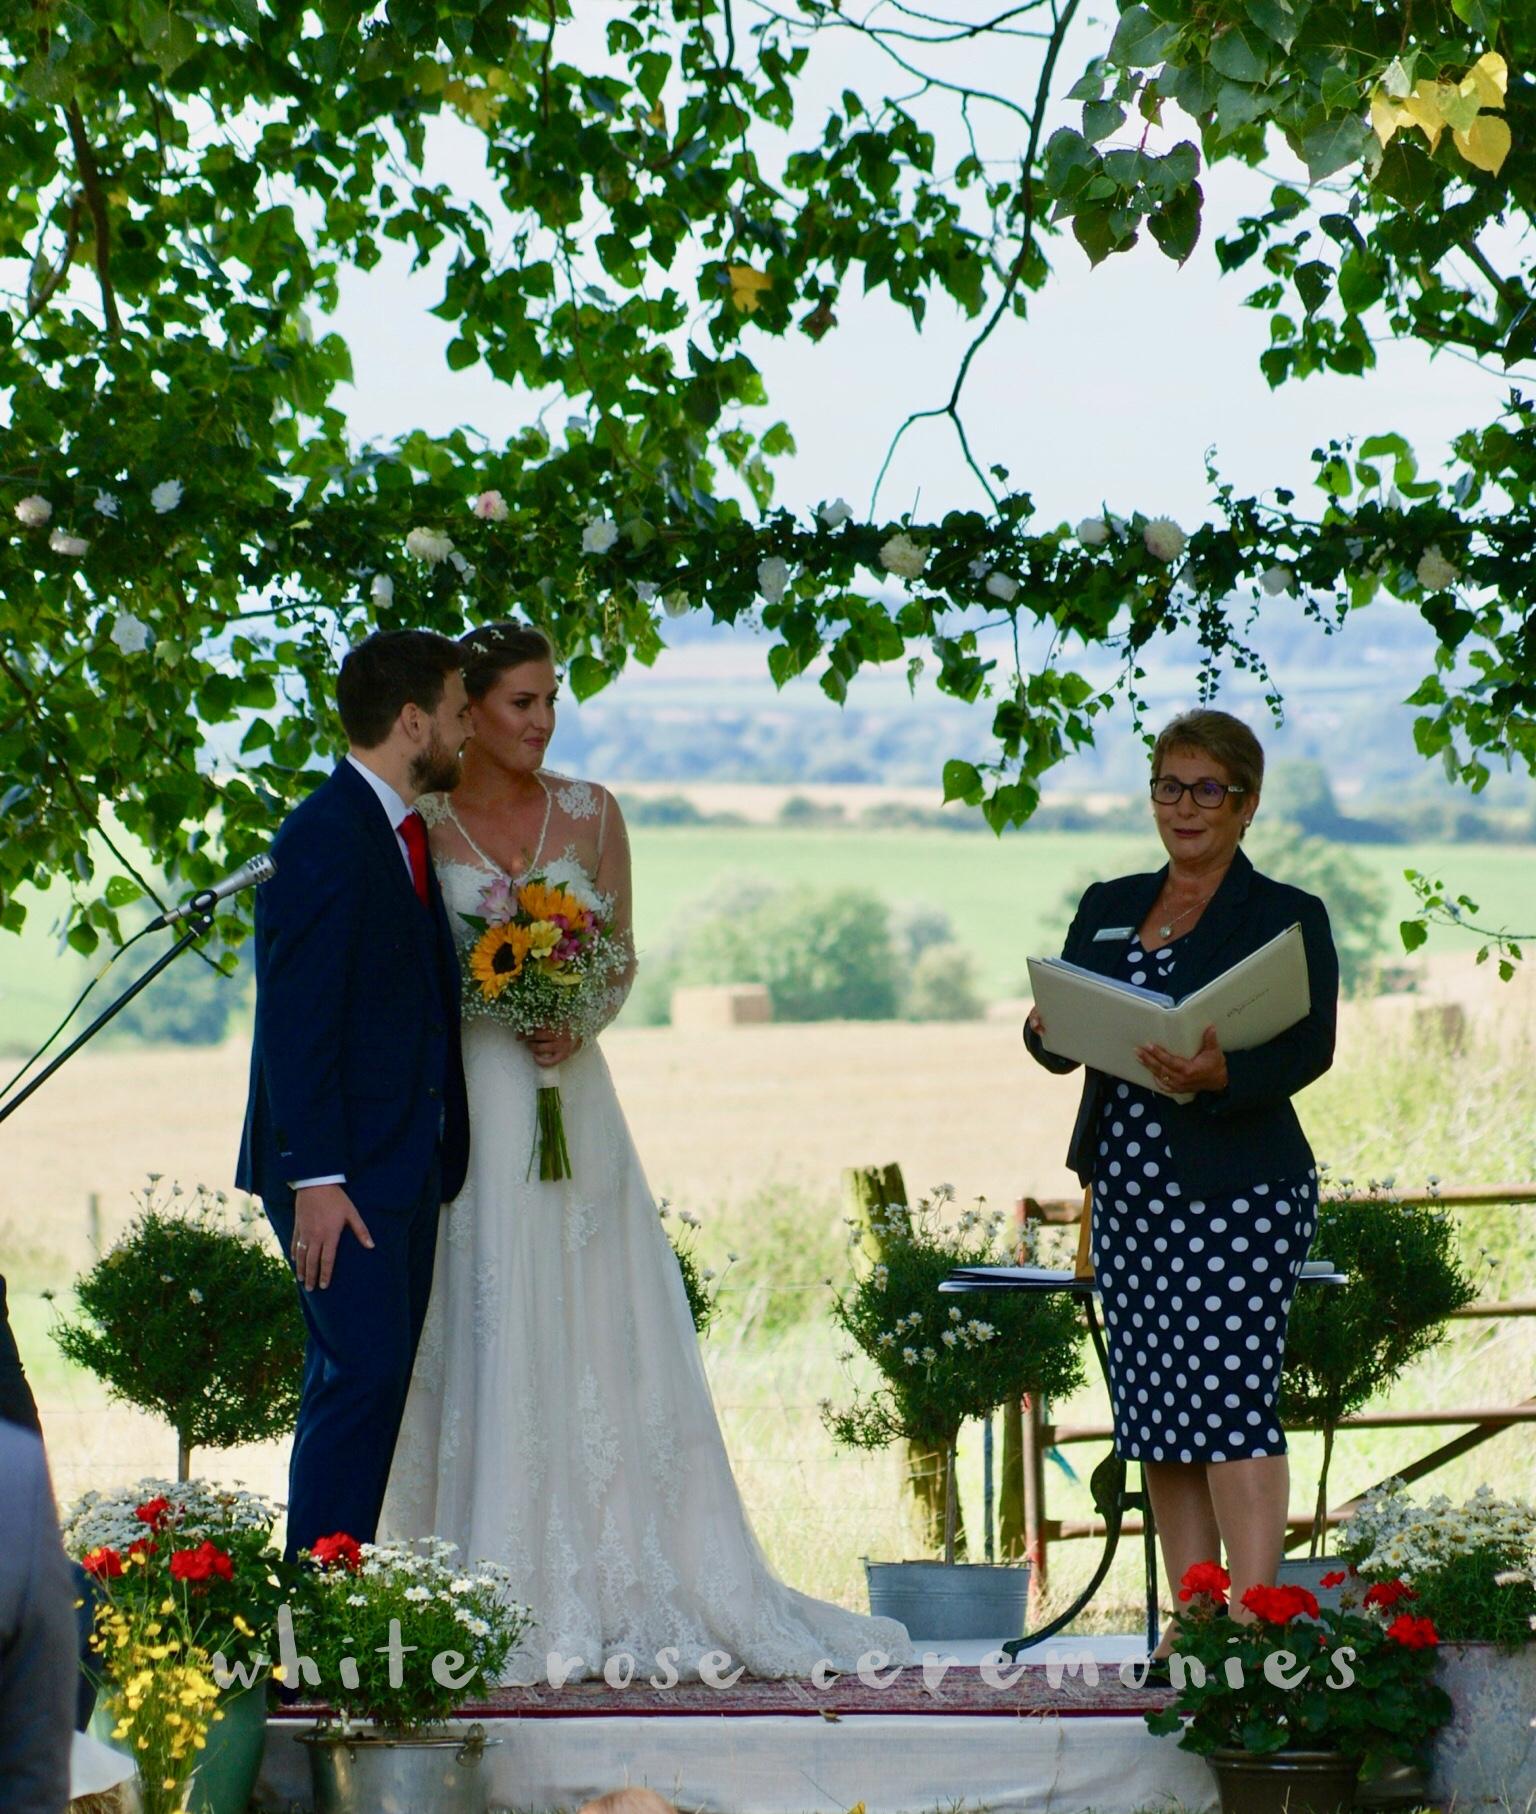 Outdoor Wedding Ceremony, perfect ceremony location, hay bales, celebrant, White Rose Ceremonies, Rebecca Waldron, creating memories, your perfect wedding ceremony